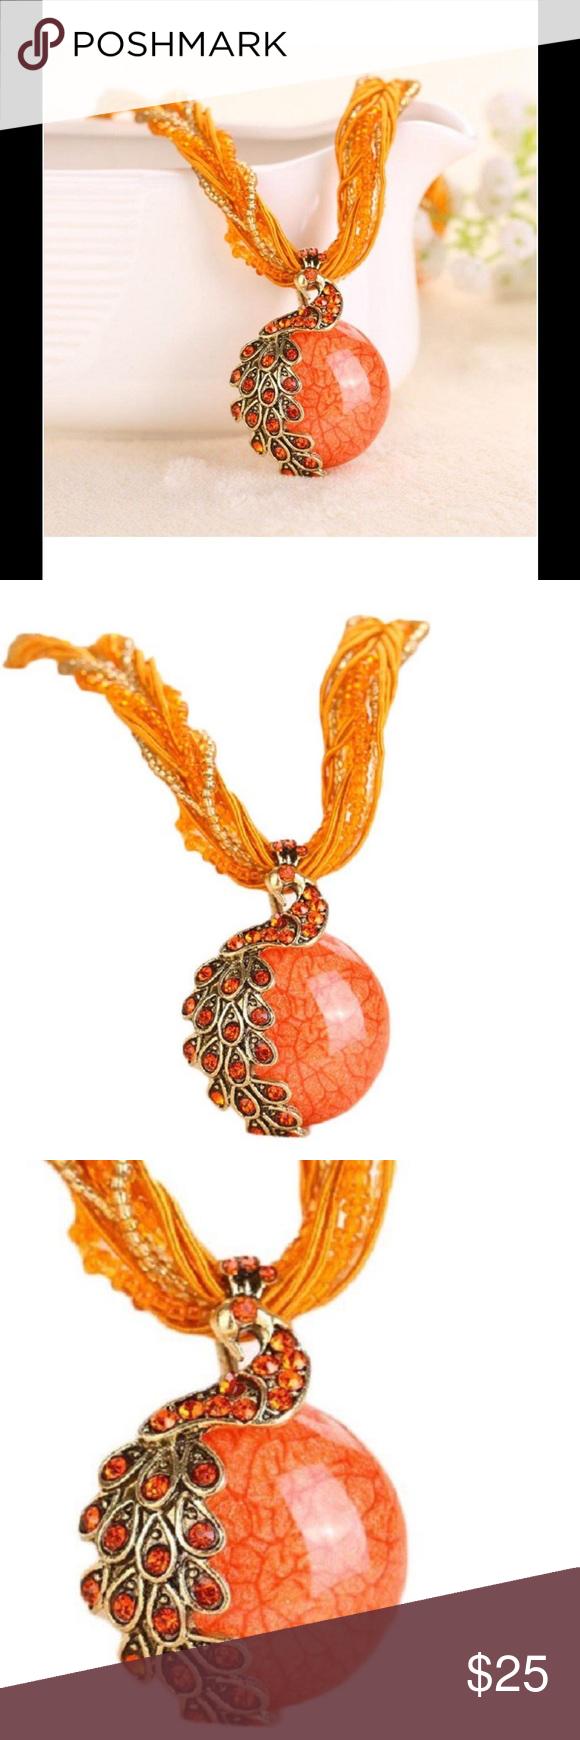 CRYSTAL PHOENIX PEACOCK NECKLACE In Orange & Gold Crystal Phoenix Peacock Necklace in Orange And Gold Jewelry Necklaces